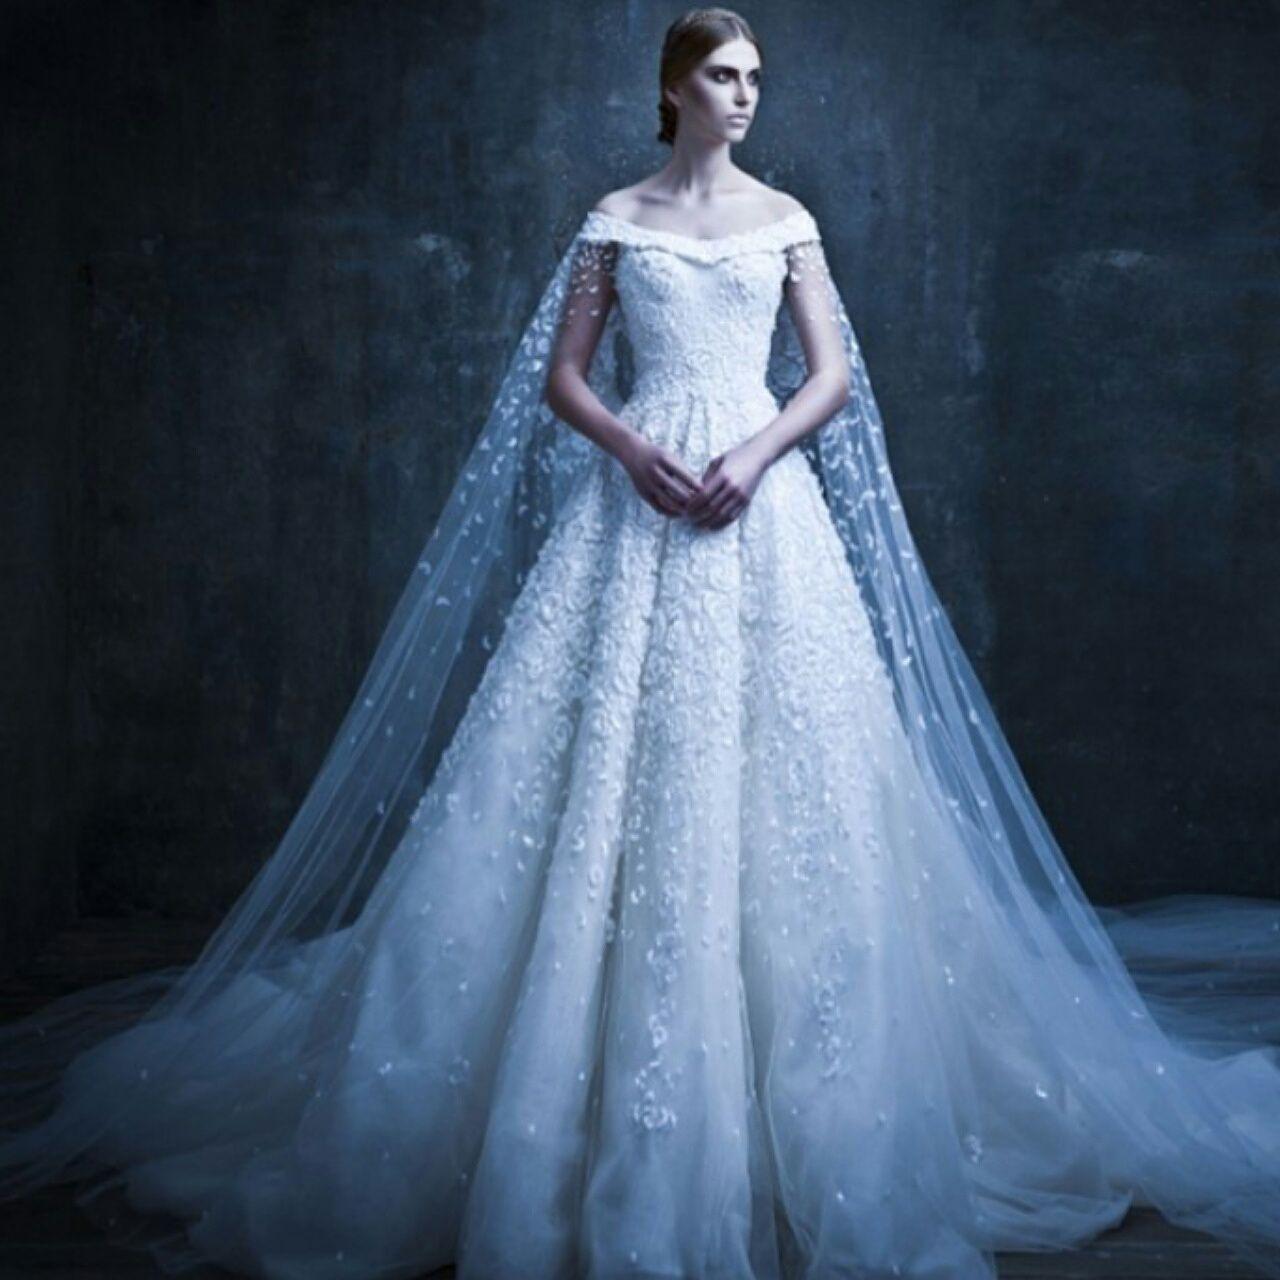 Dorable Michael Cinco Wedding Gowns For Sale Image - Wedding Dress ...